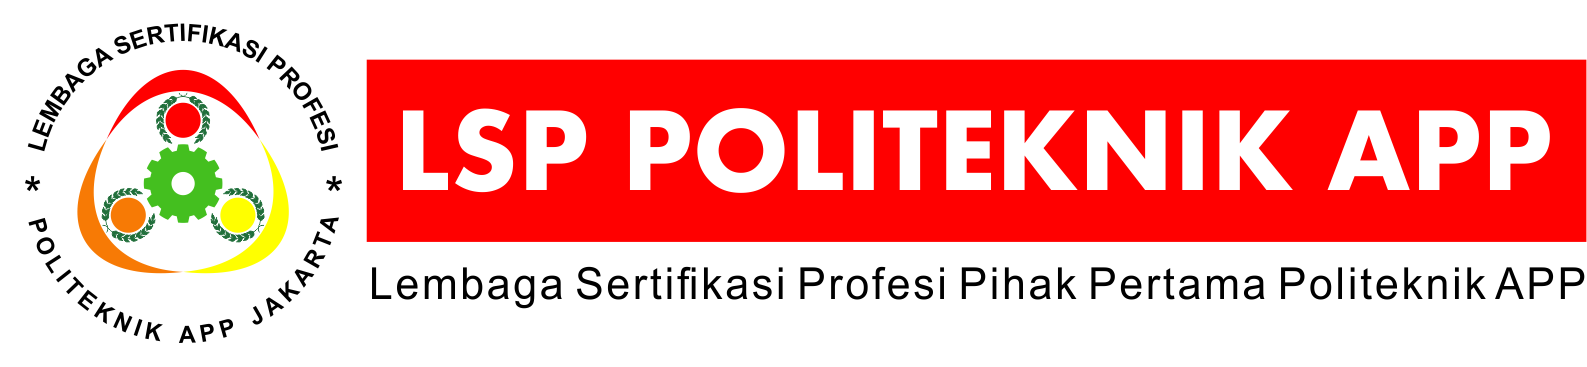 LSP Politeknik APP Jakarta